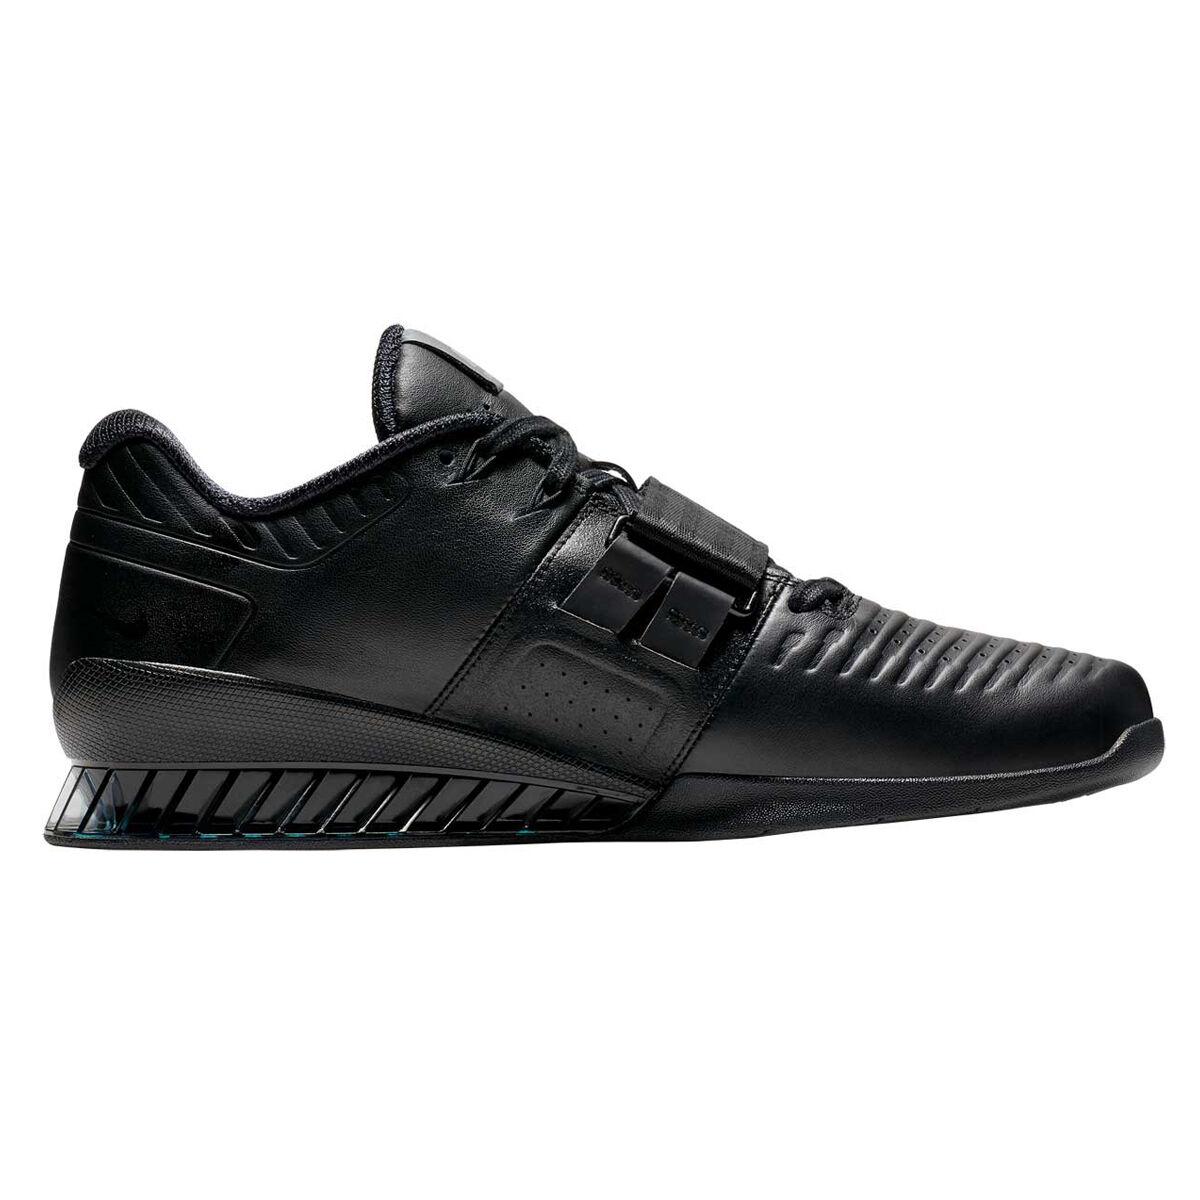 Nike Romaleos 3 XD Mens Training Shoes